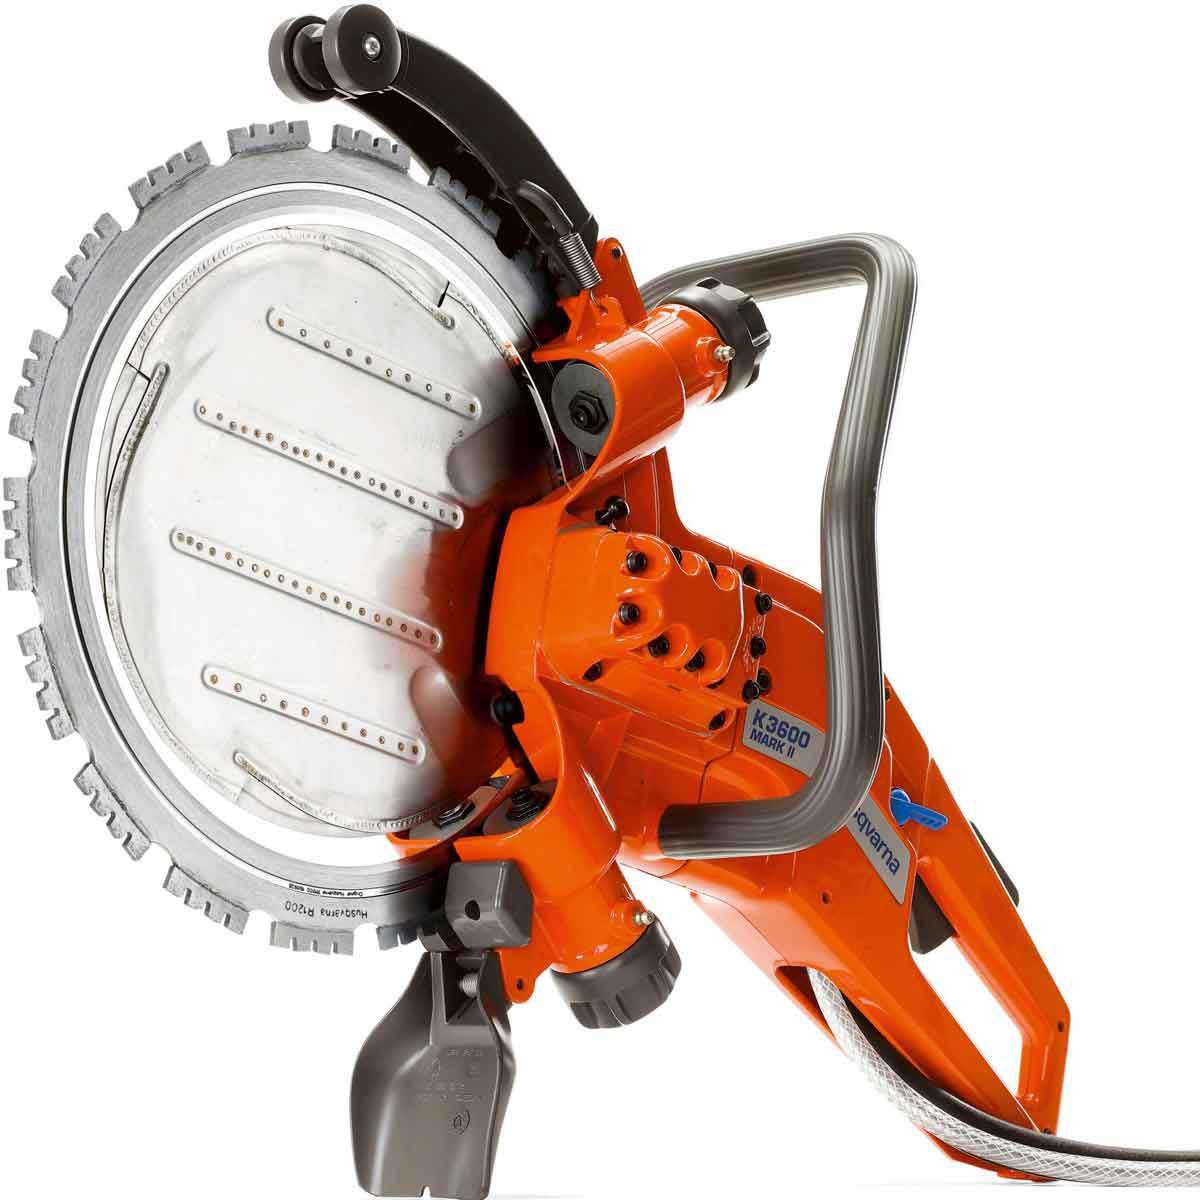 Husqvarna K3600 Hydraulic saw